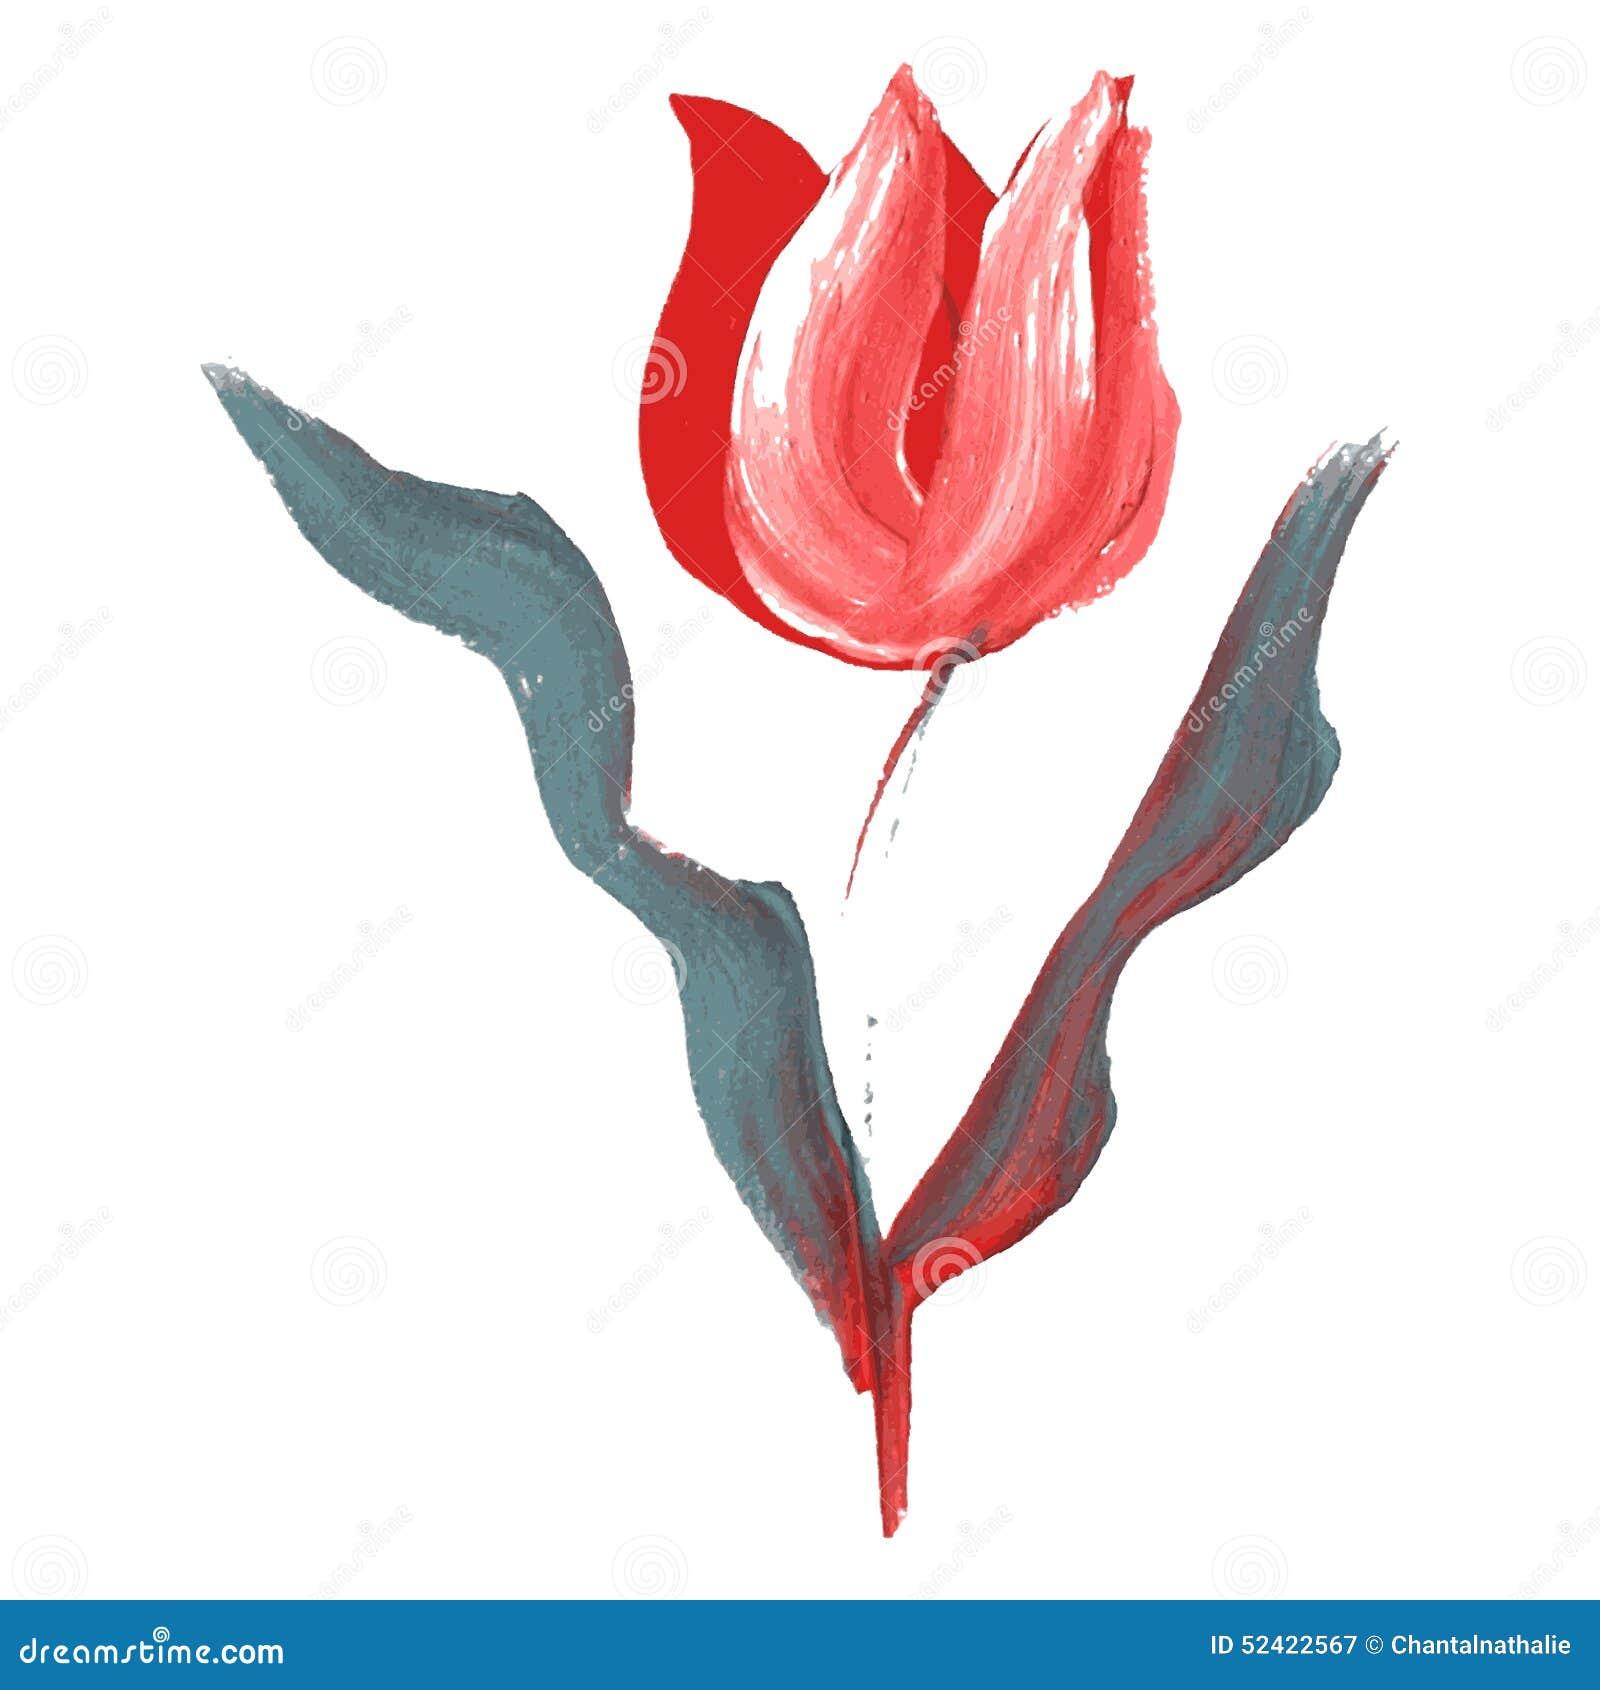 Oil painted flower